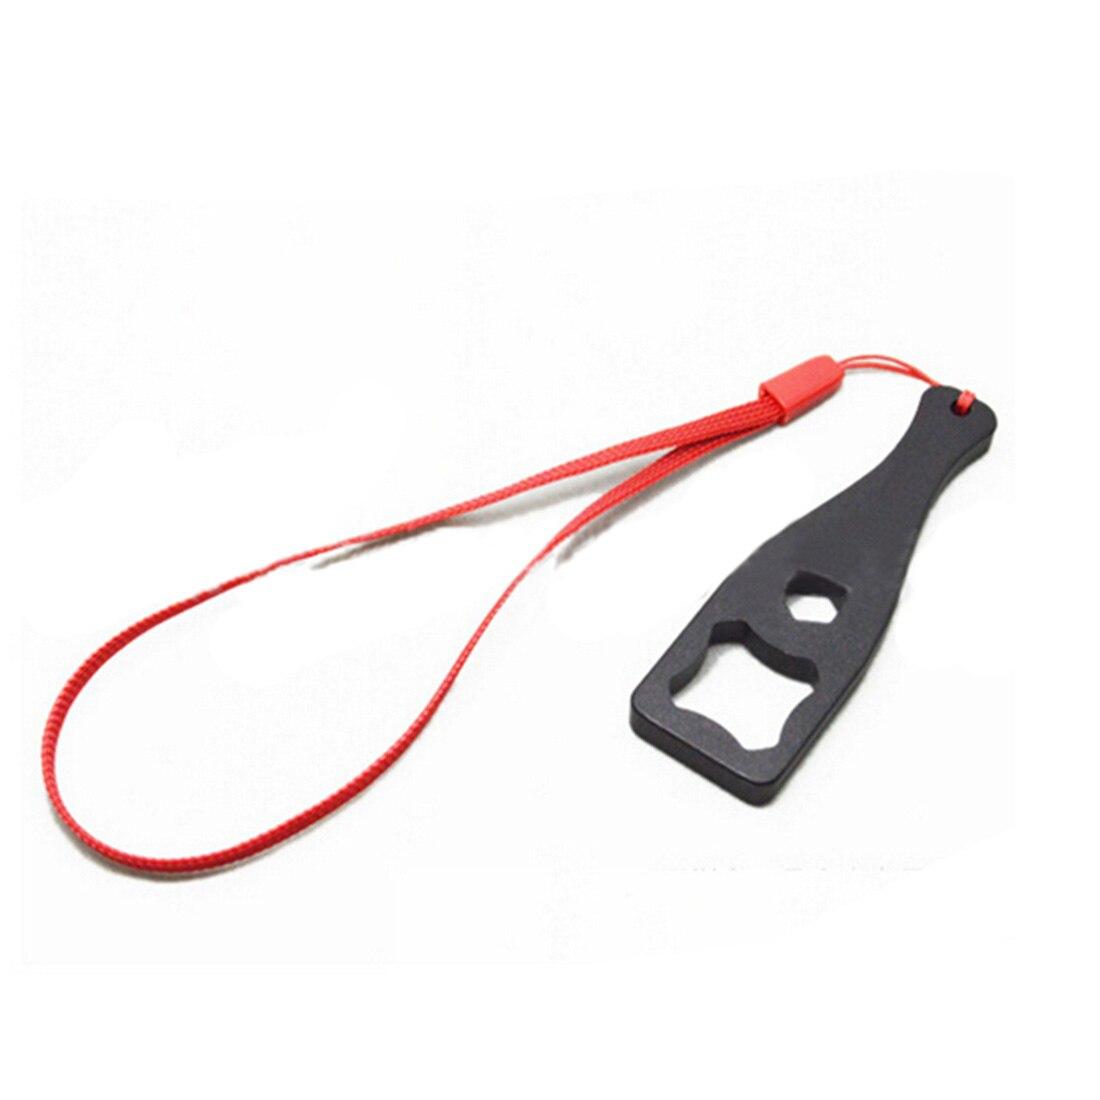 New Black Plastic Tighten Knob Bolt Nut Screw Wrench Spanner For Gopro